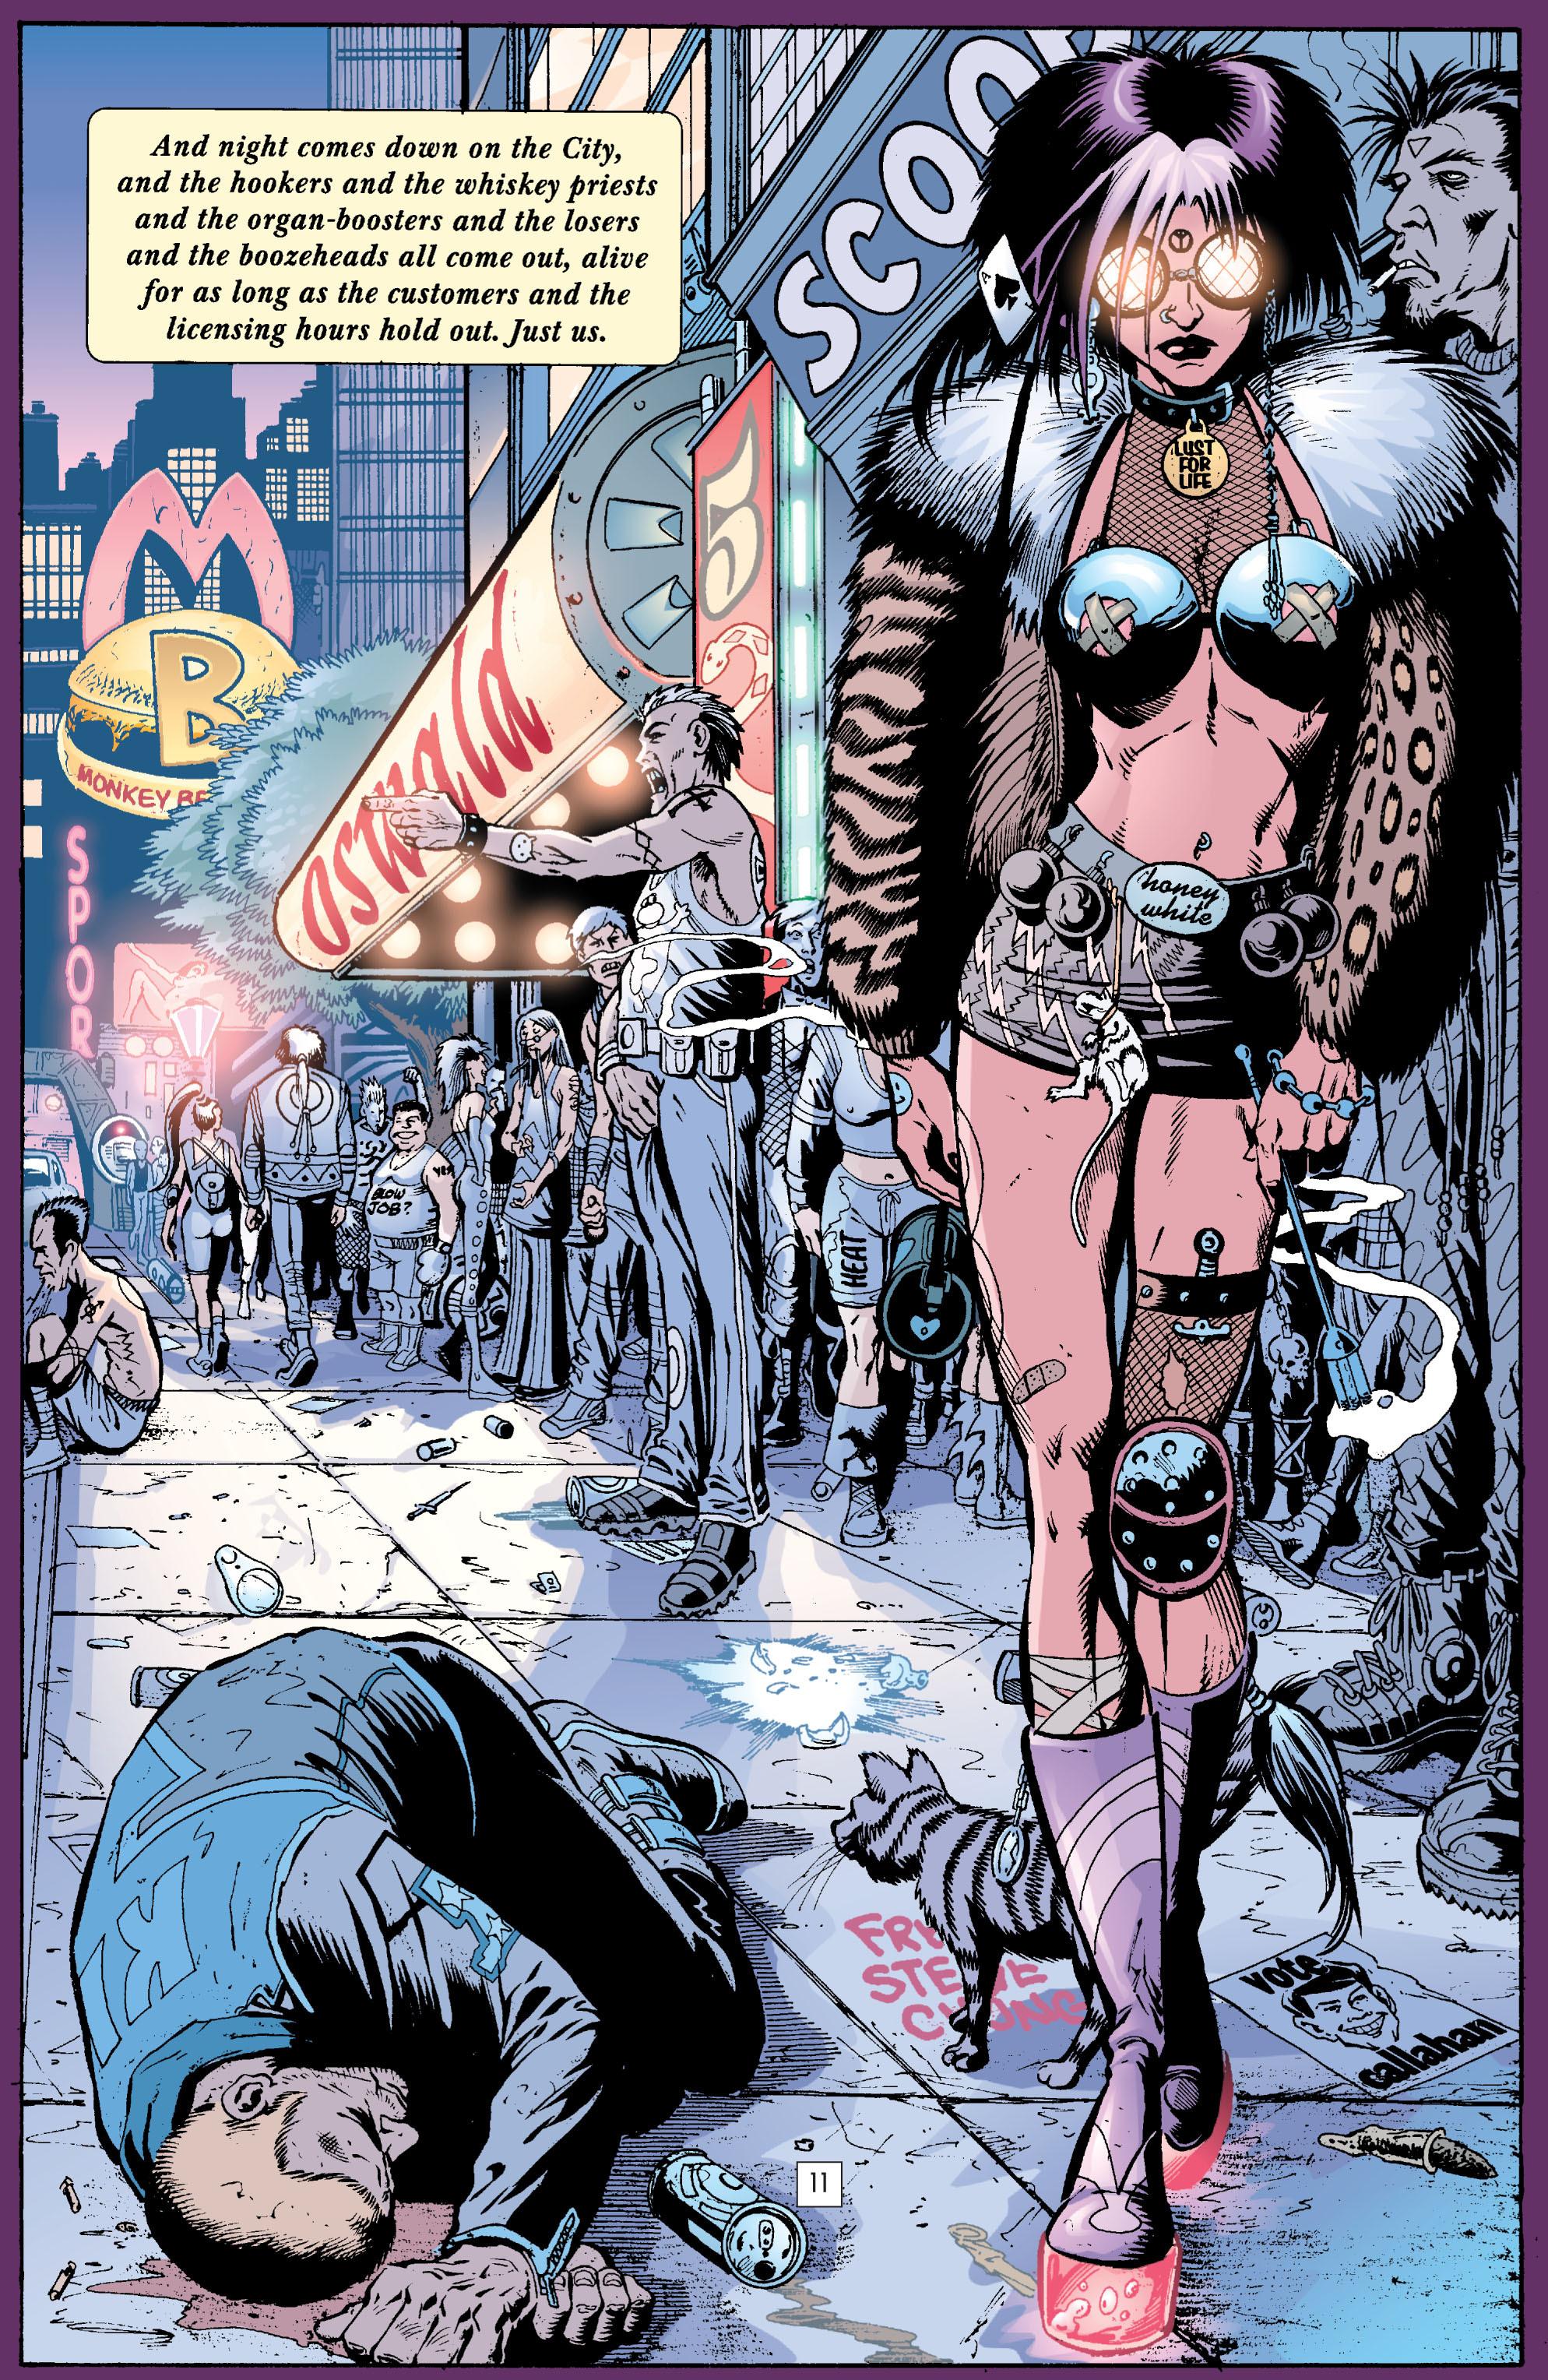 Read online Transmetropolitan comic -  Issue #23 - 12